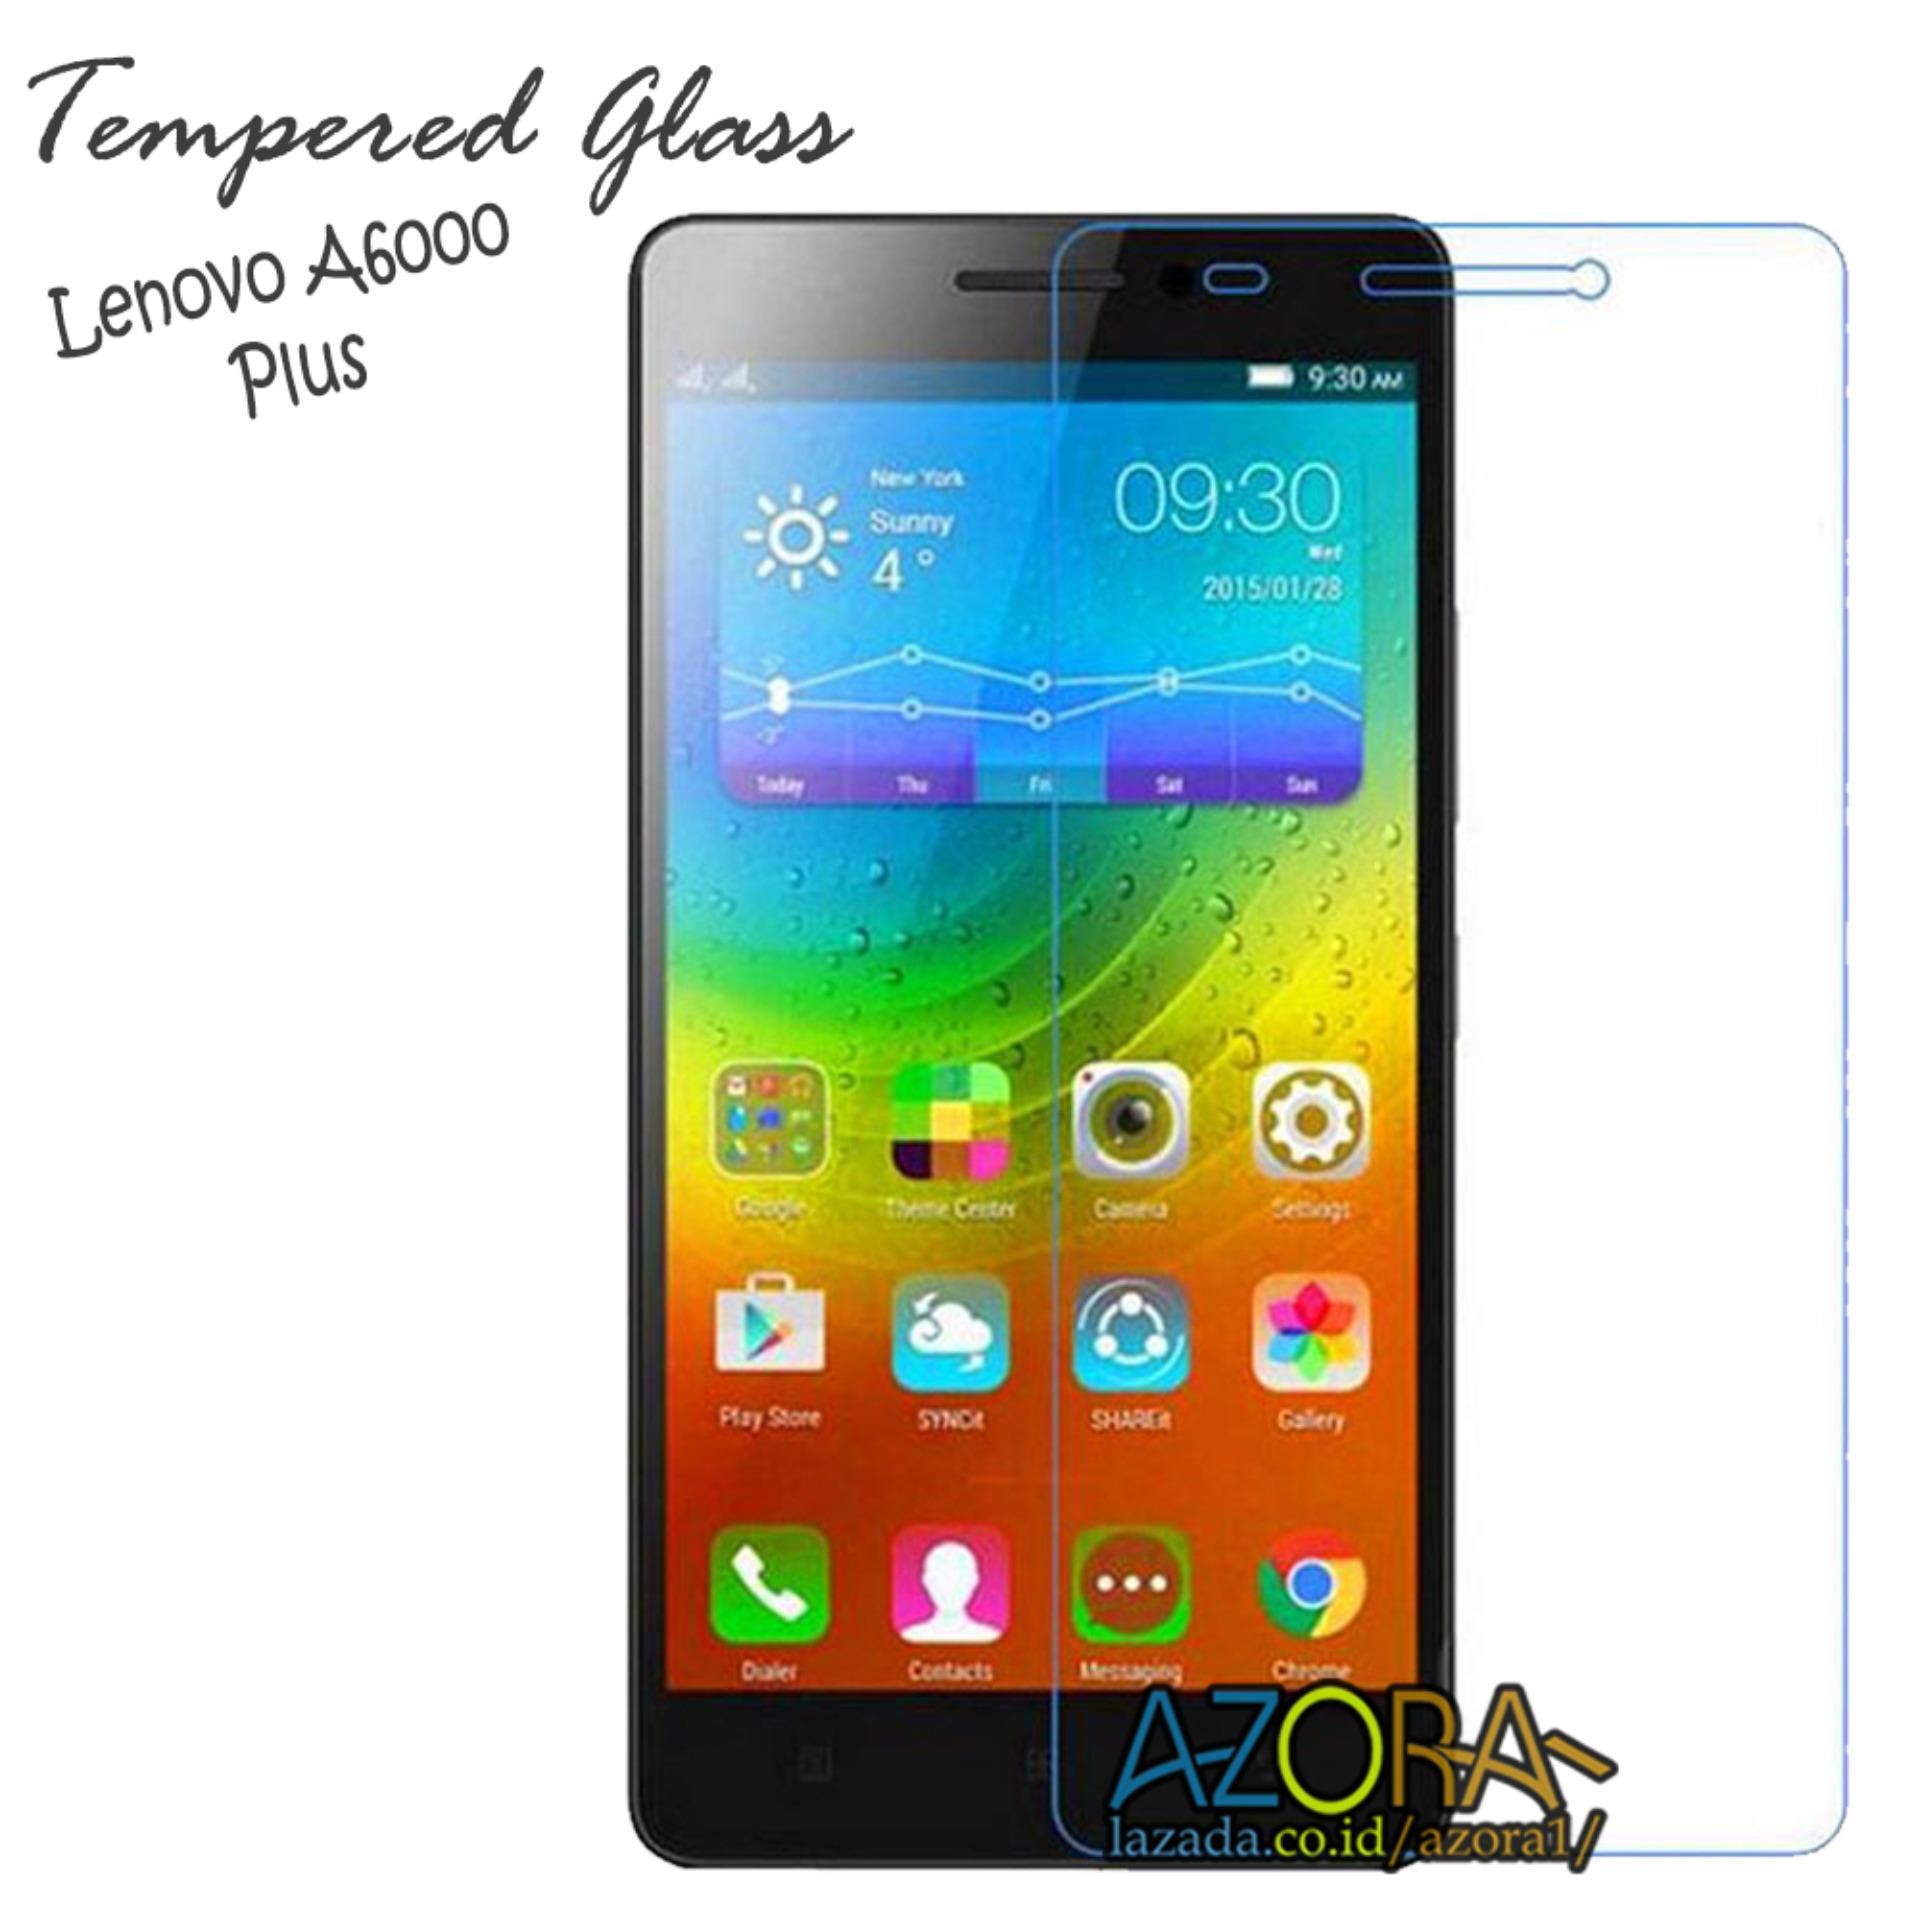 Tempered Glass Lenovo A6000 Plus Screen Protector Pelindung Layar Kaca Anti Gores Bening